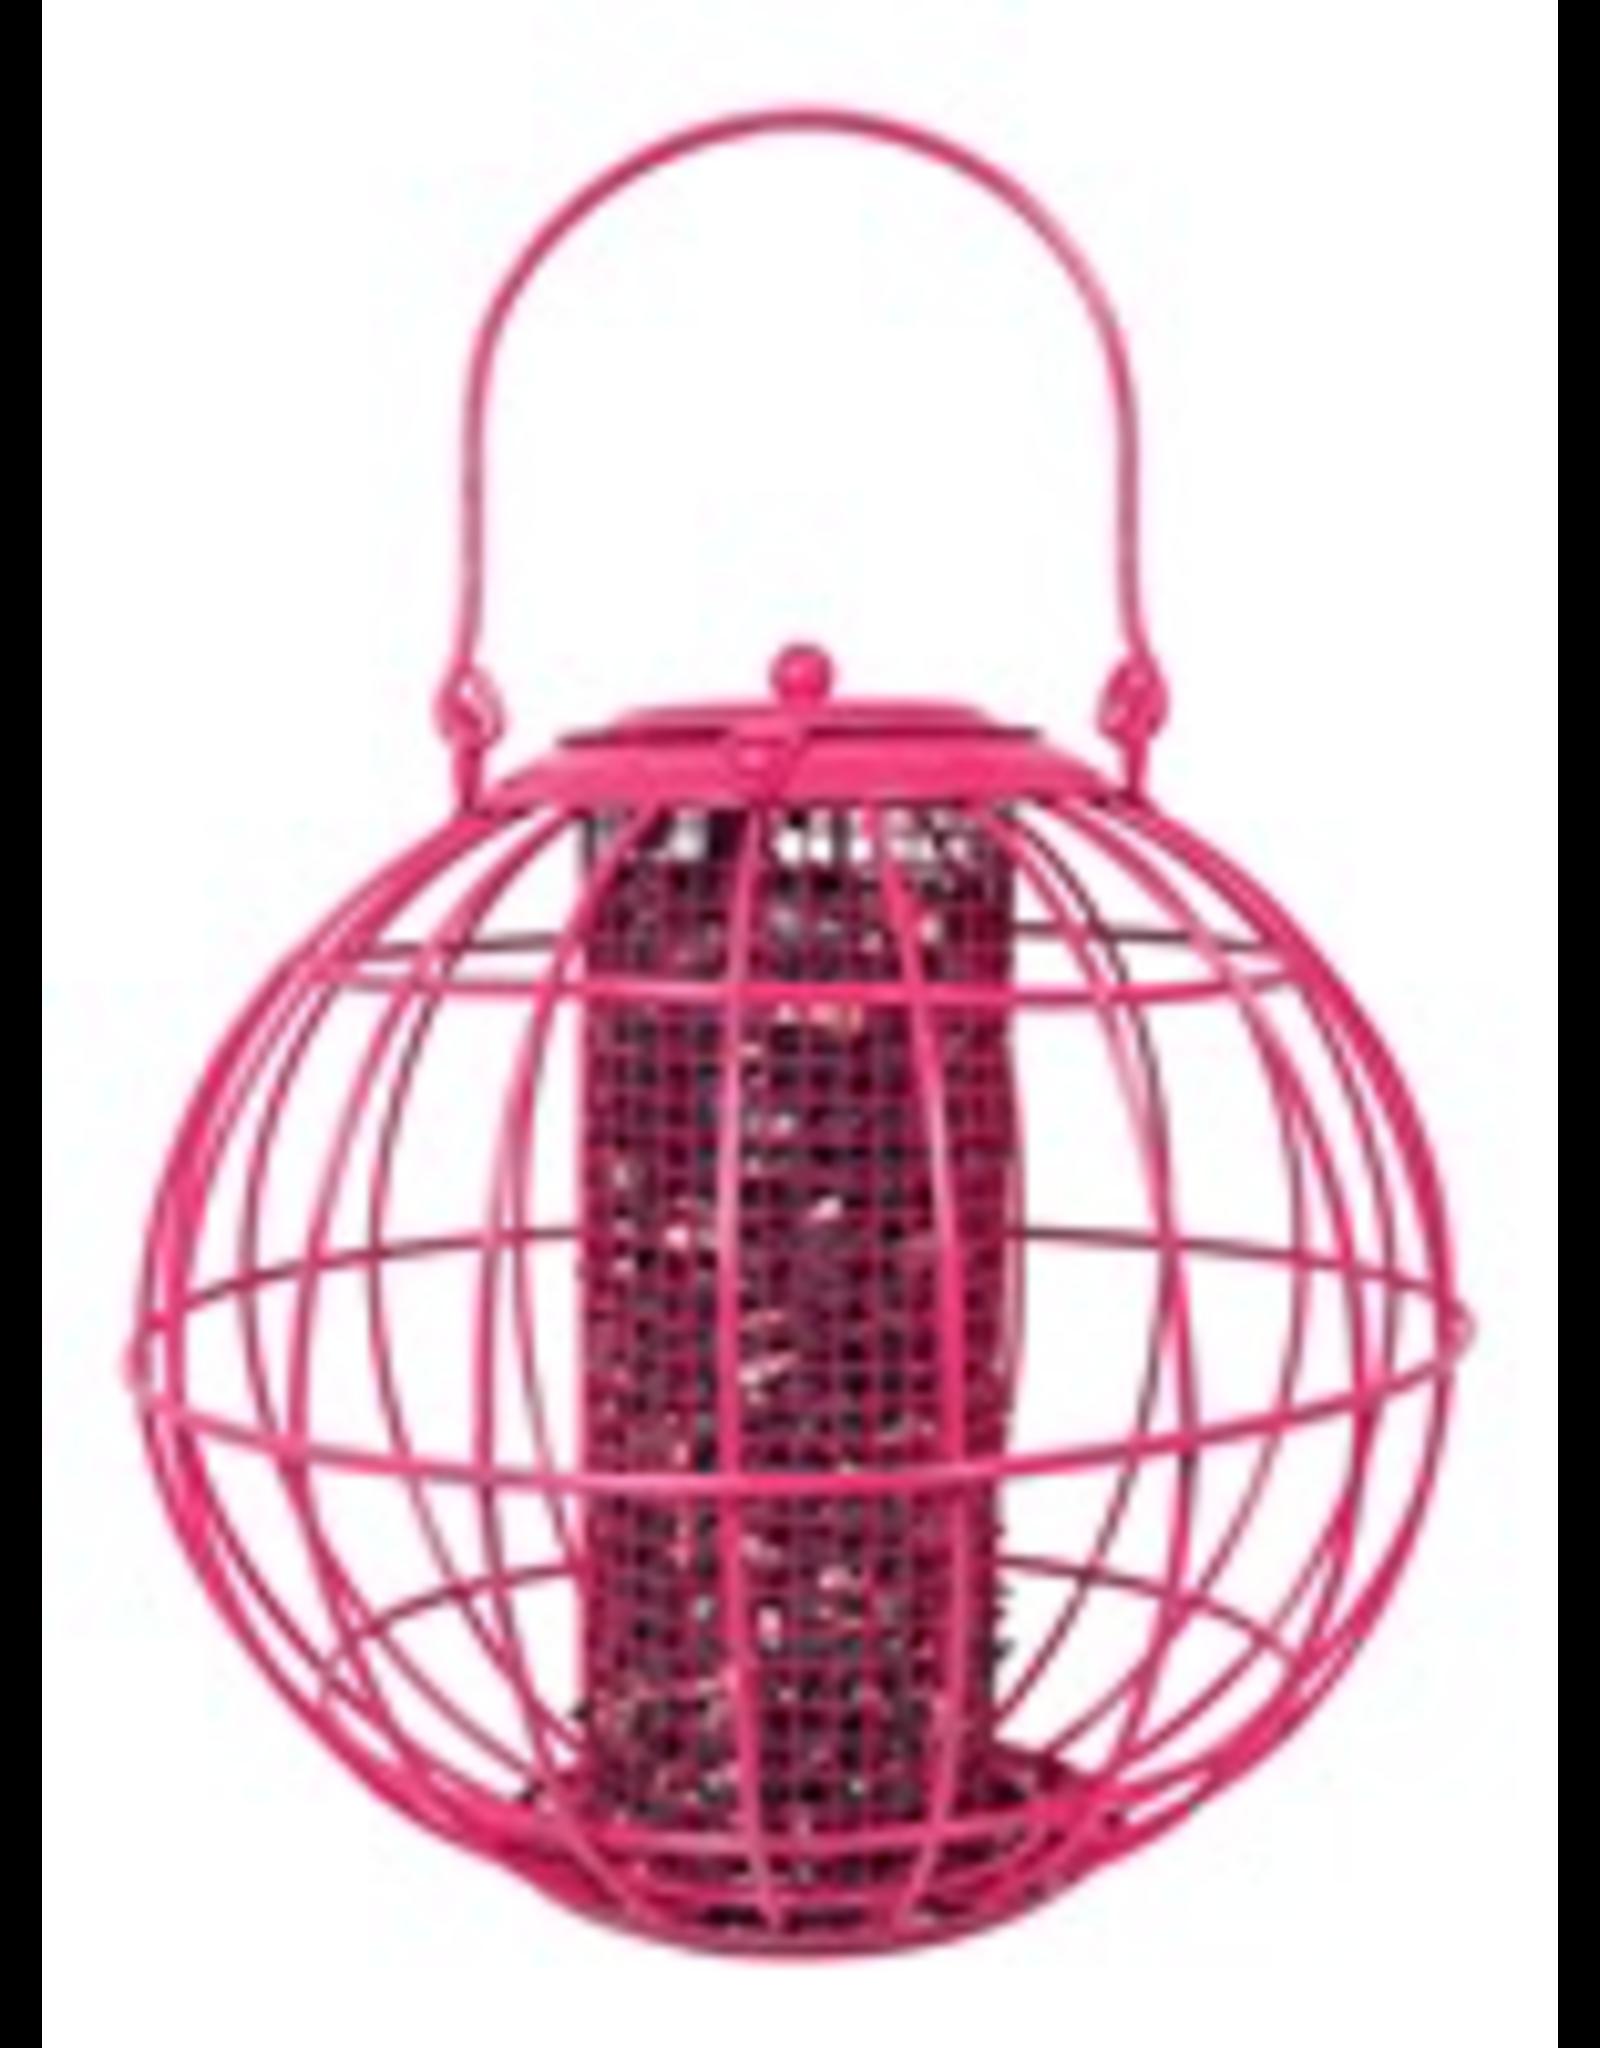 Pinebush PB10384 ROSE RED GLOBE BO/PNUT FEEDER-discontinued